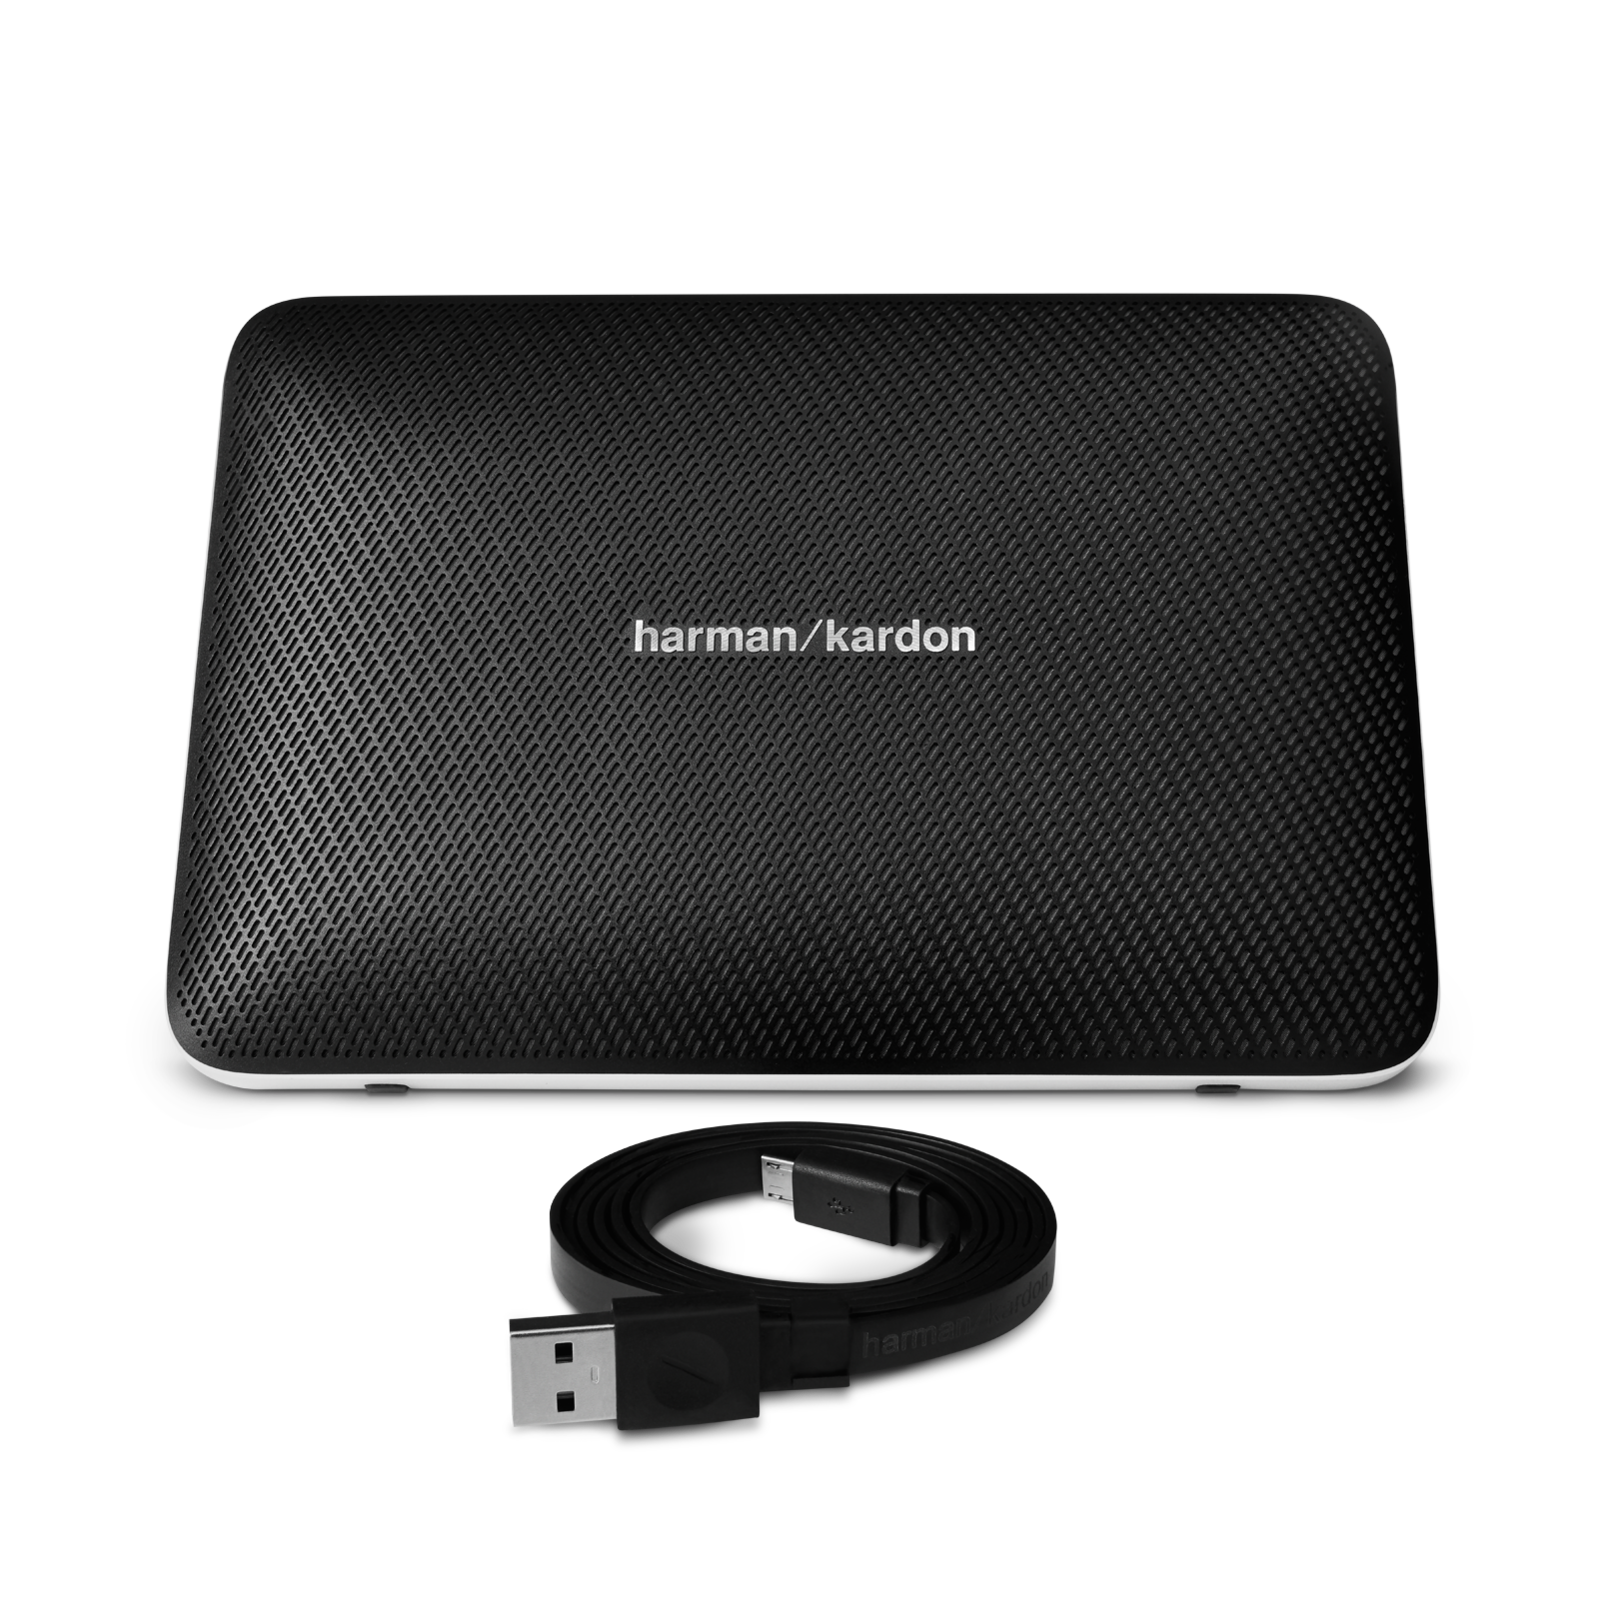 Esquire 2 - Black - Premium portable Bluetooth speaker with quad microphone conferencing system - Detailshot 2